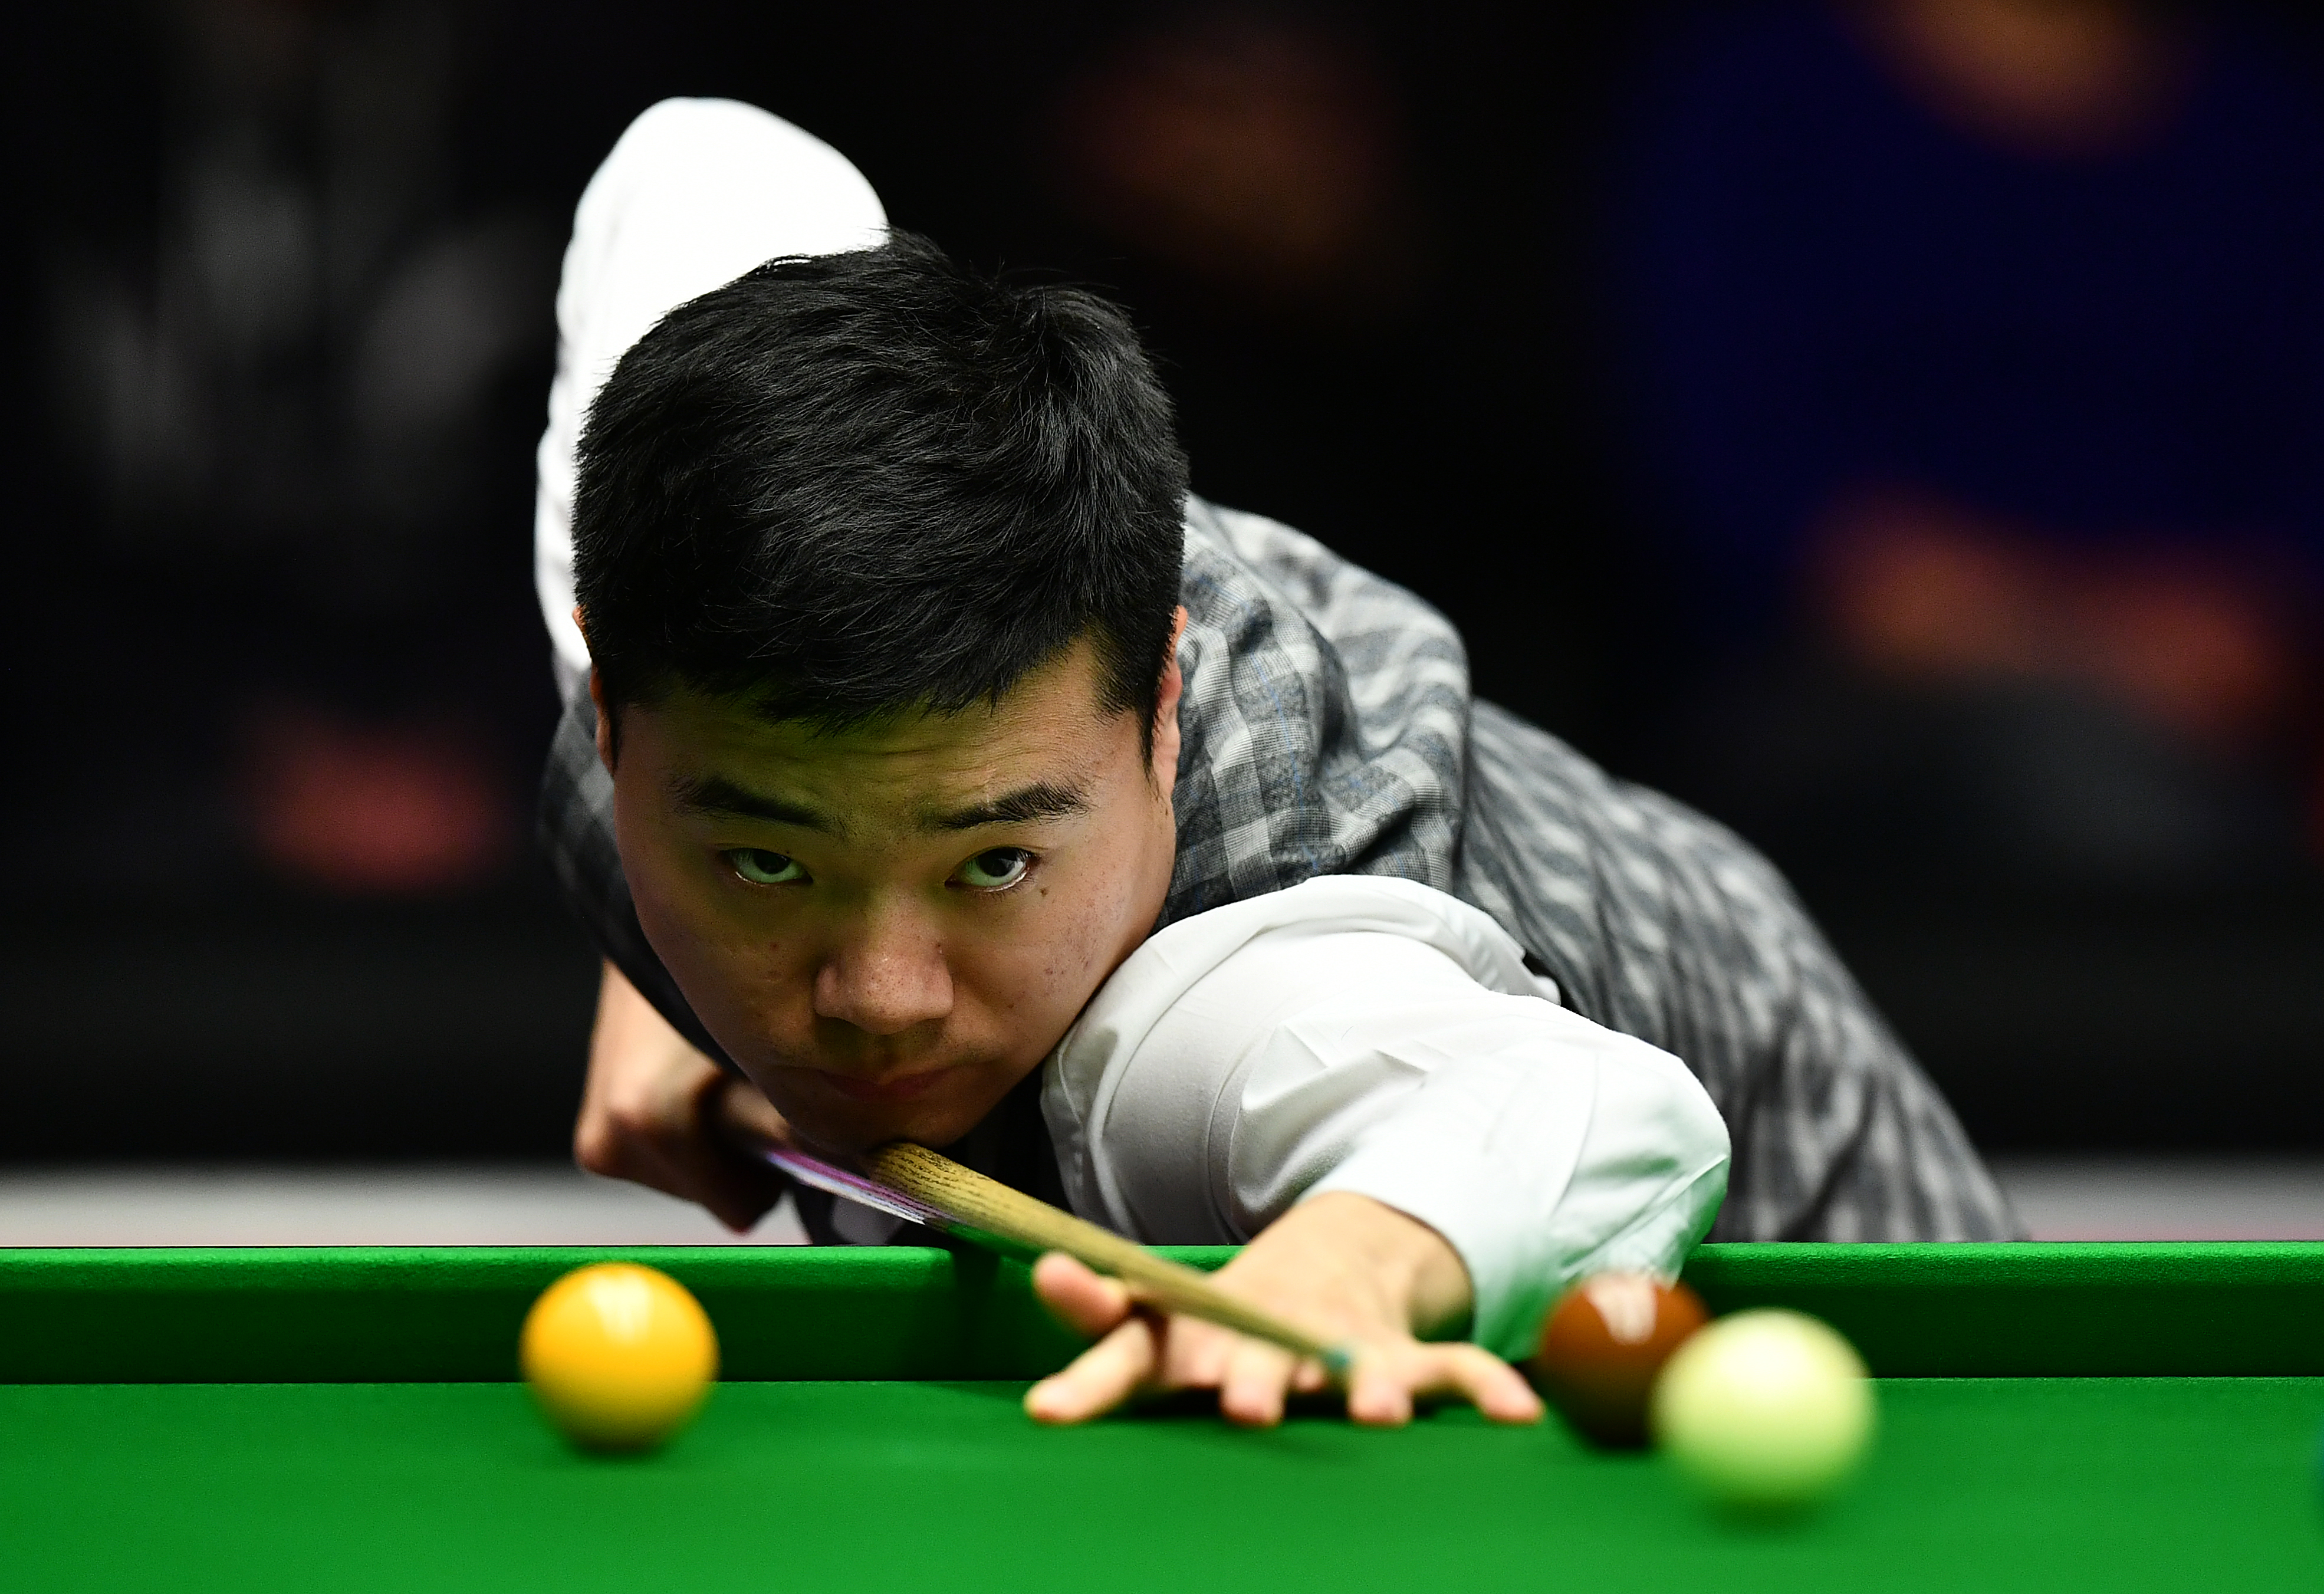 World Snooker Championship: Meet China's Ding Junhui | Time